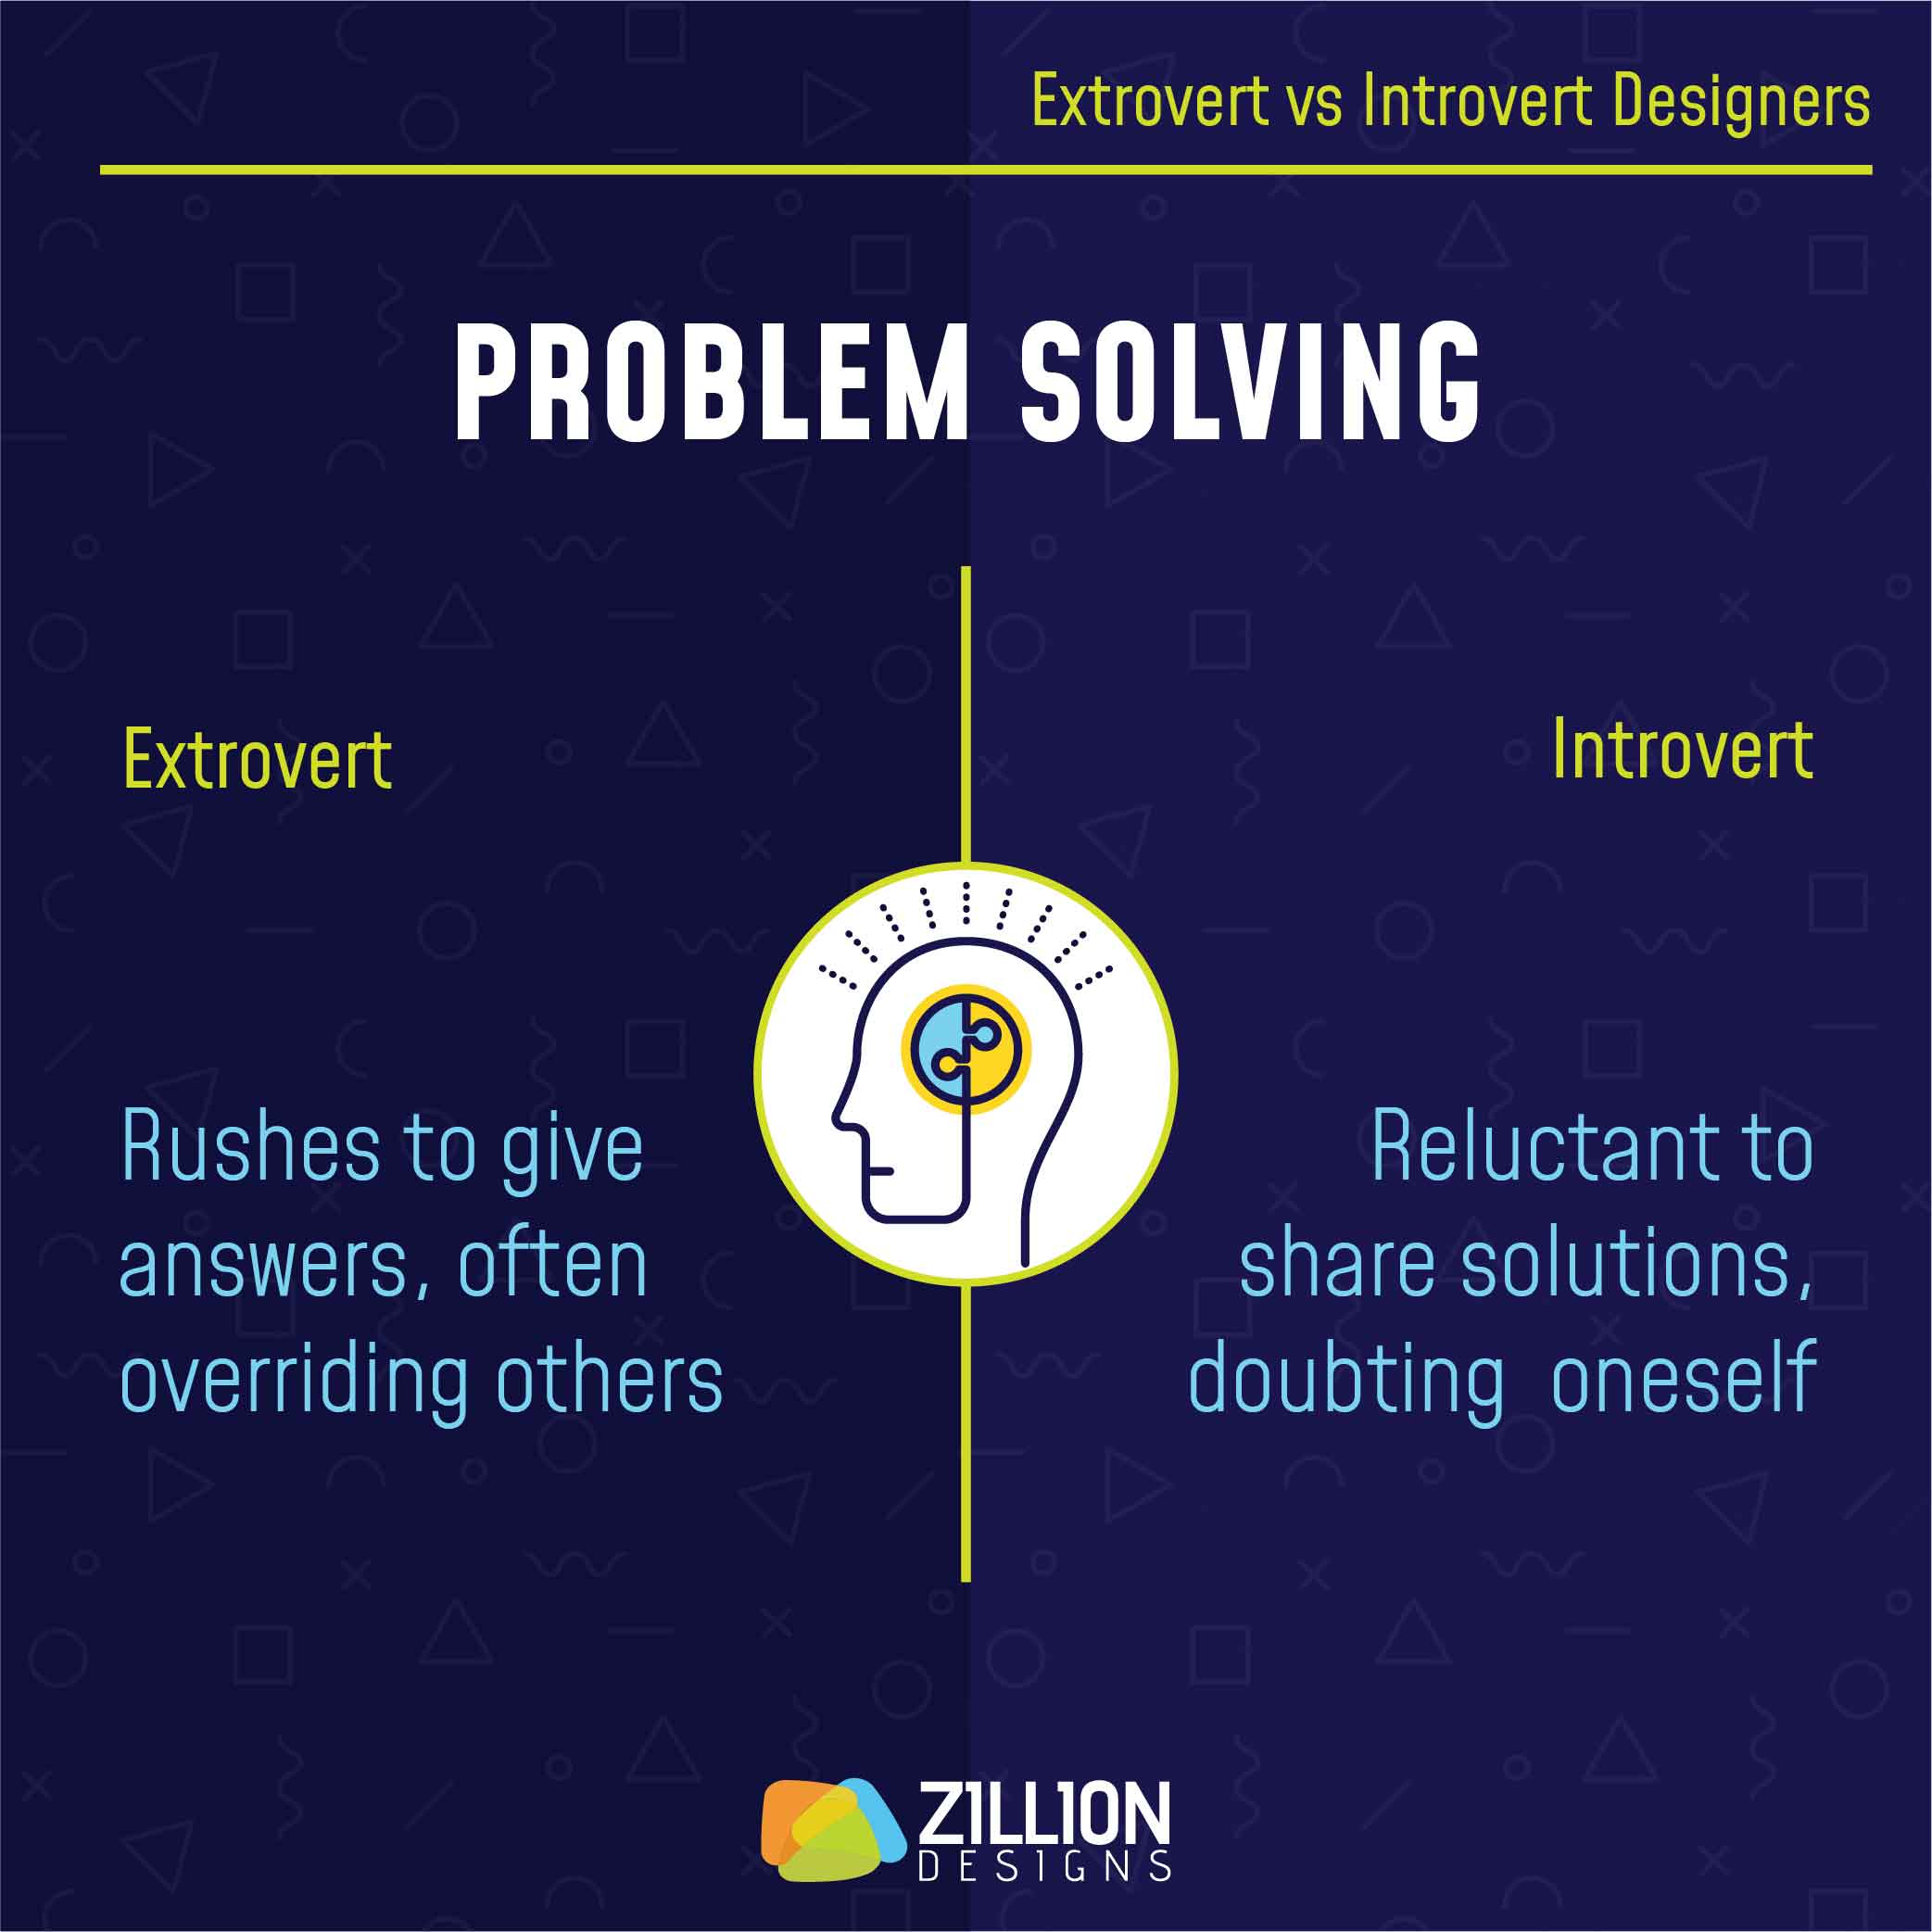 Extrovert vs Introvert Designers 6